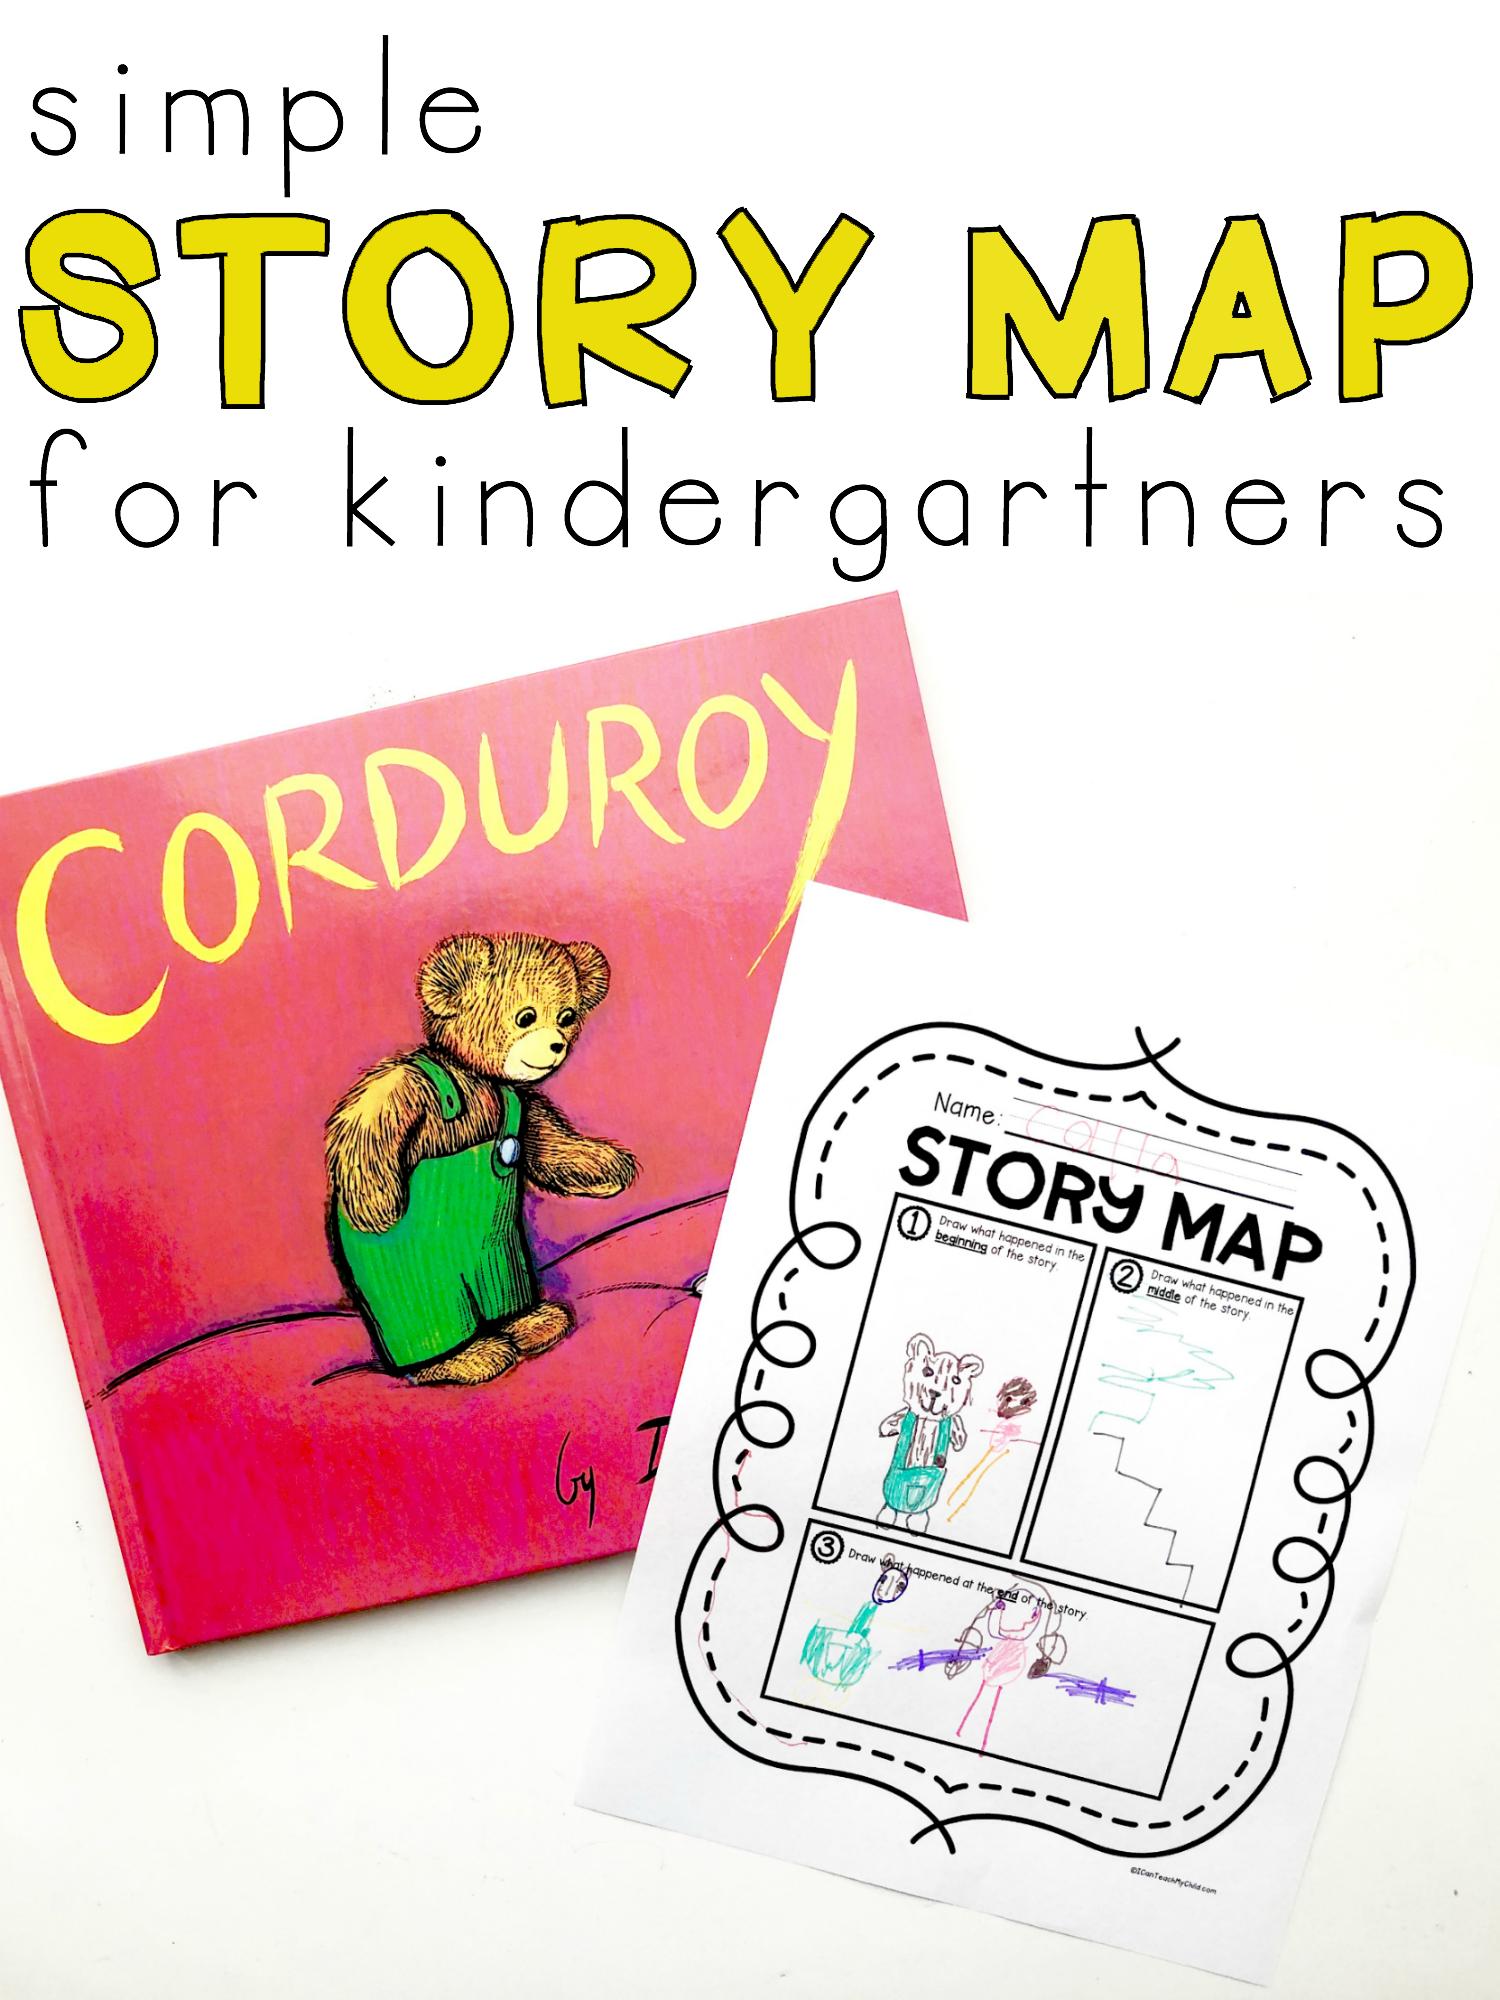 Simple Story Map Printable For Kindergartners